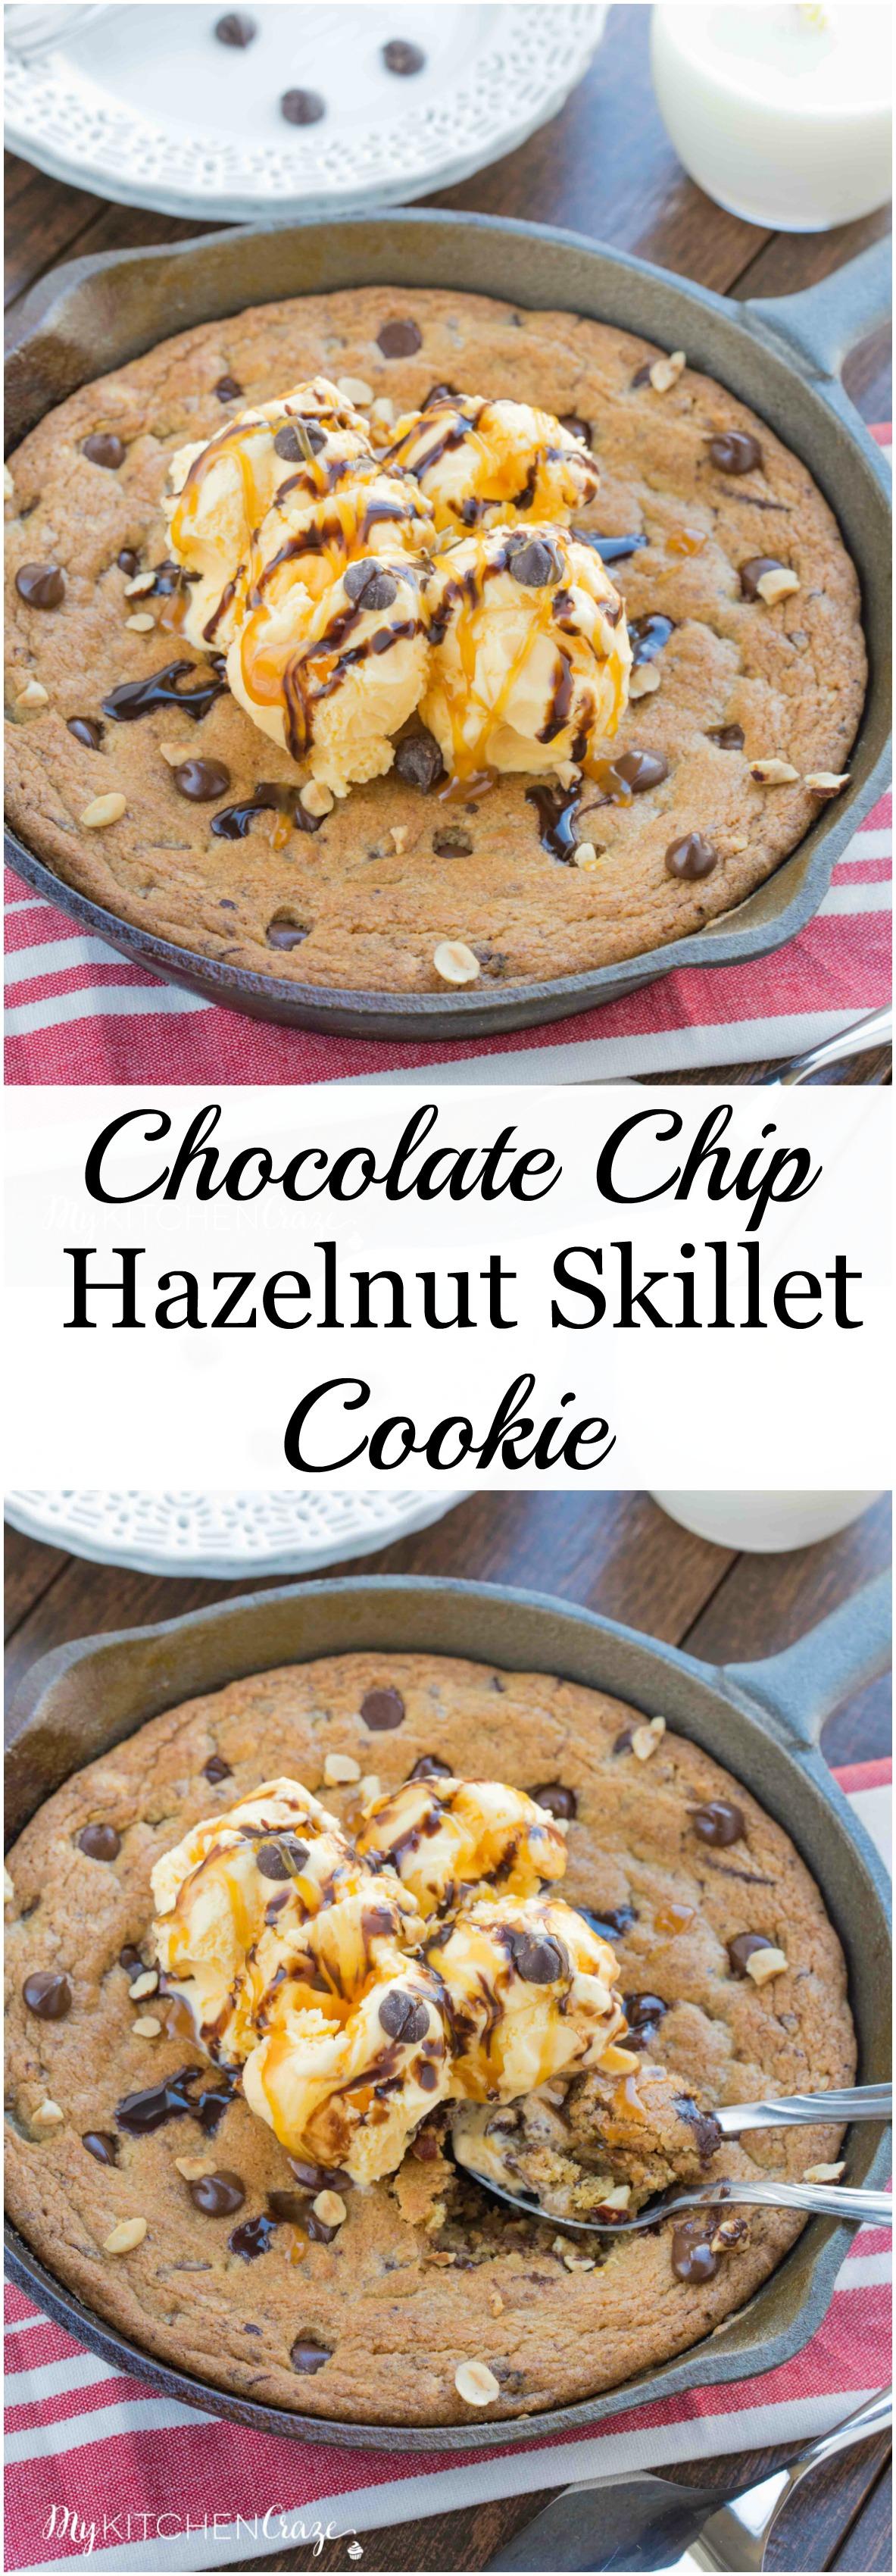 Chocolate Chip Hazelnut Skillet Cookie ~ mykitchencraze.com